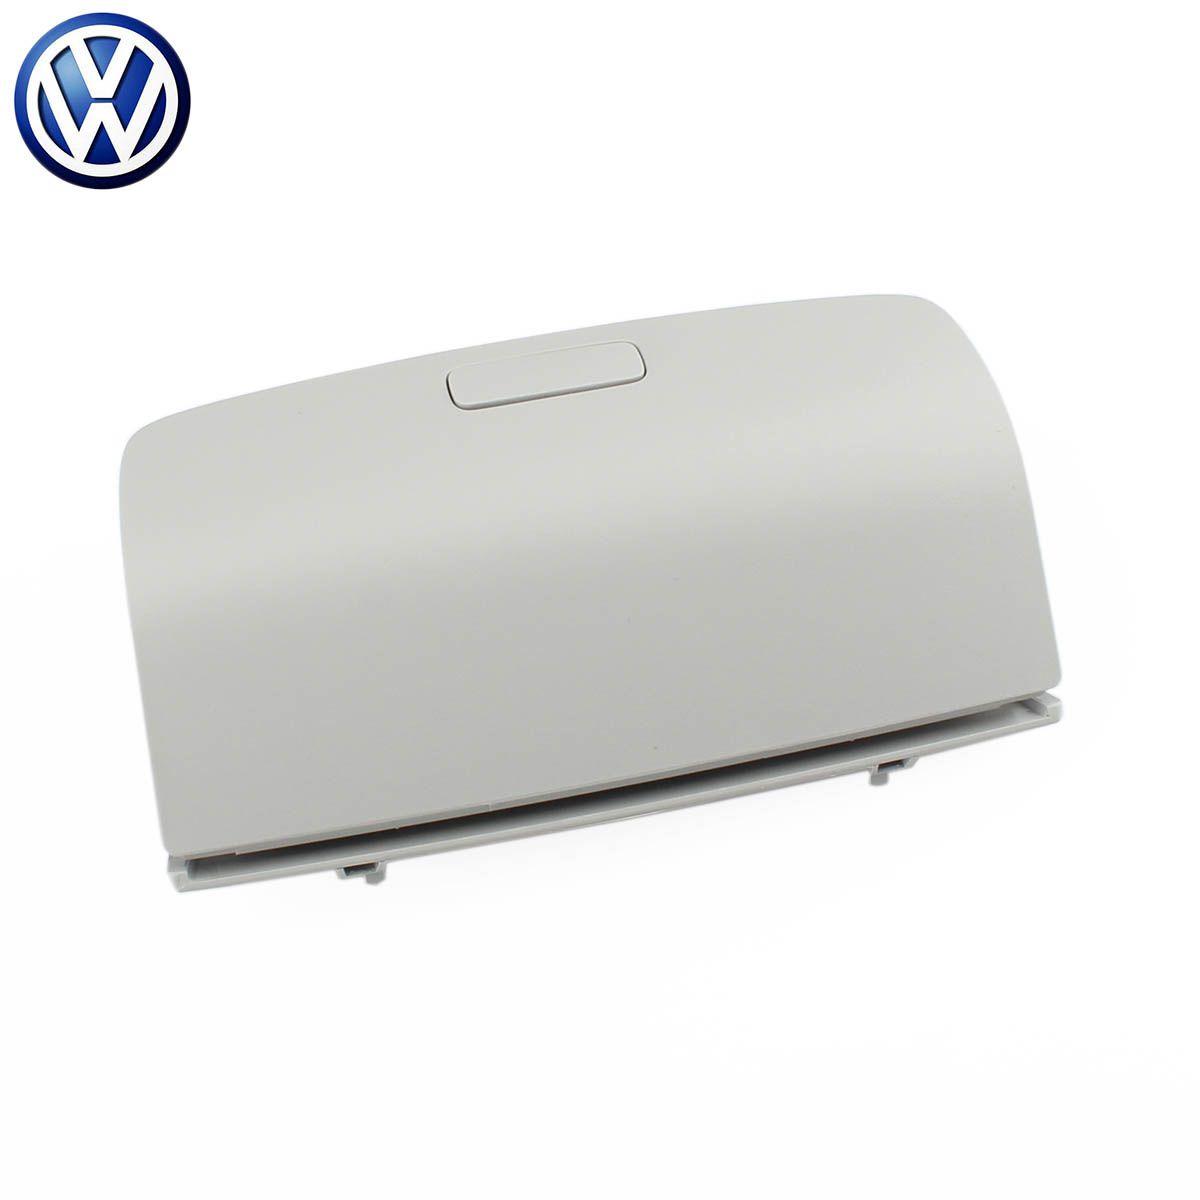 OEM 1K0 868 837 Grey Car Sun Glasses Case Storage Box fit for VW Golf MK6 Jetta MK5 Passat Tiguan Skoda Superb Yeti